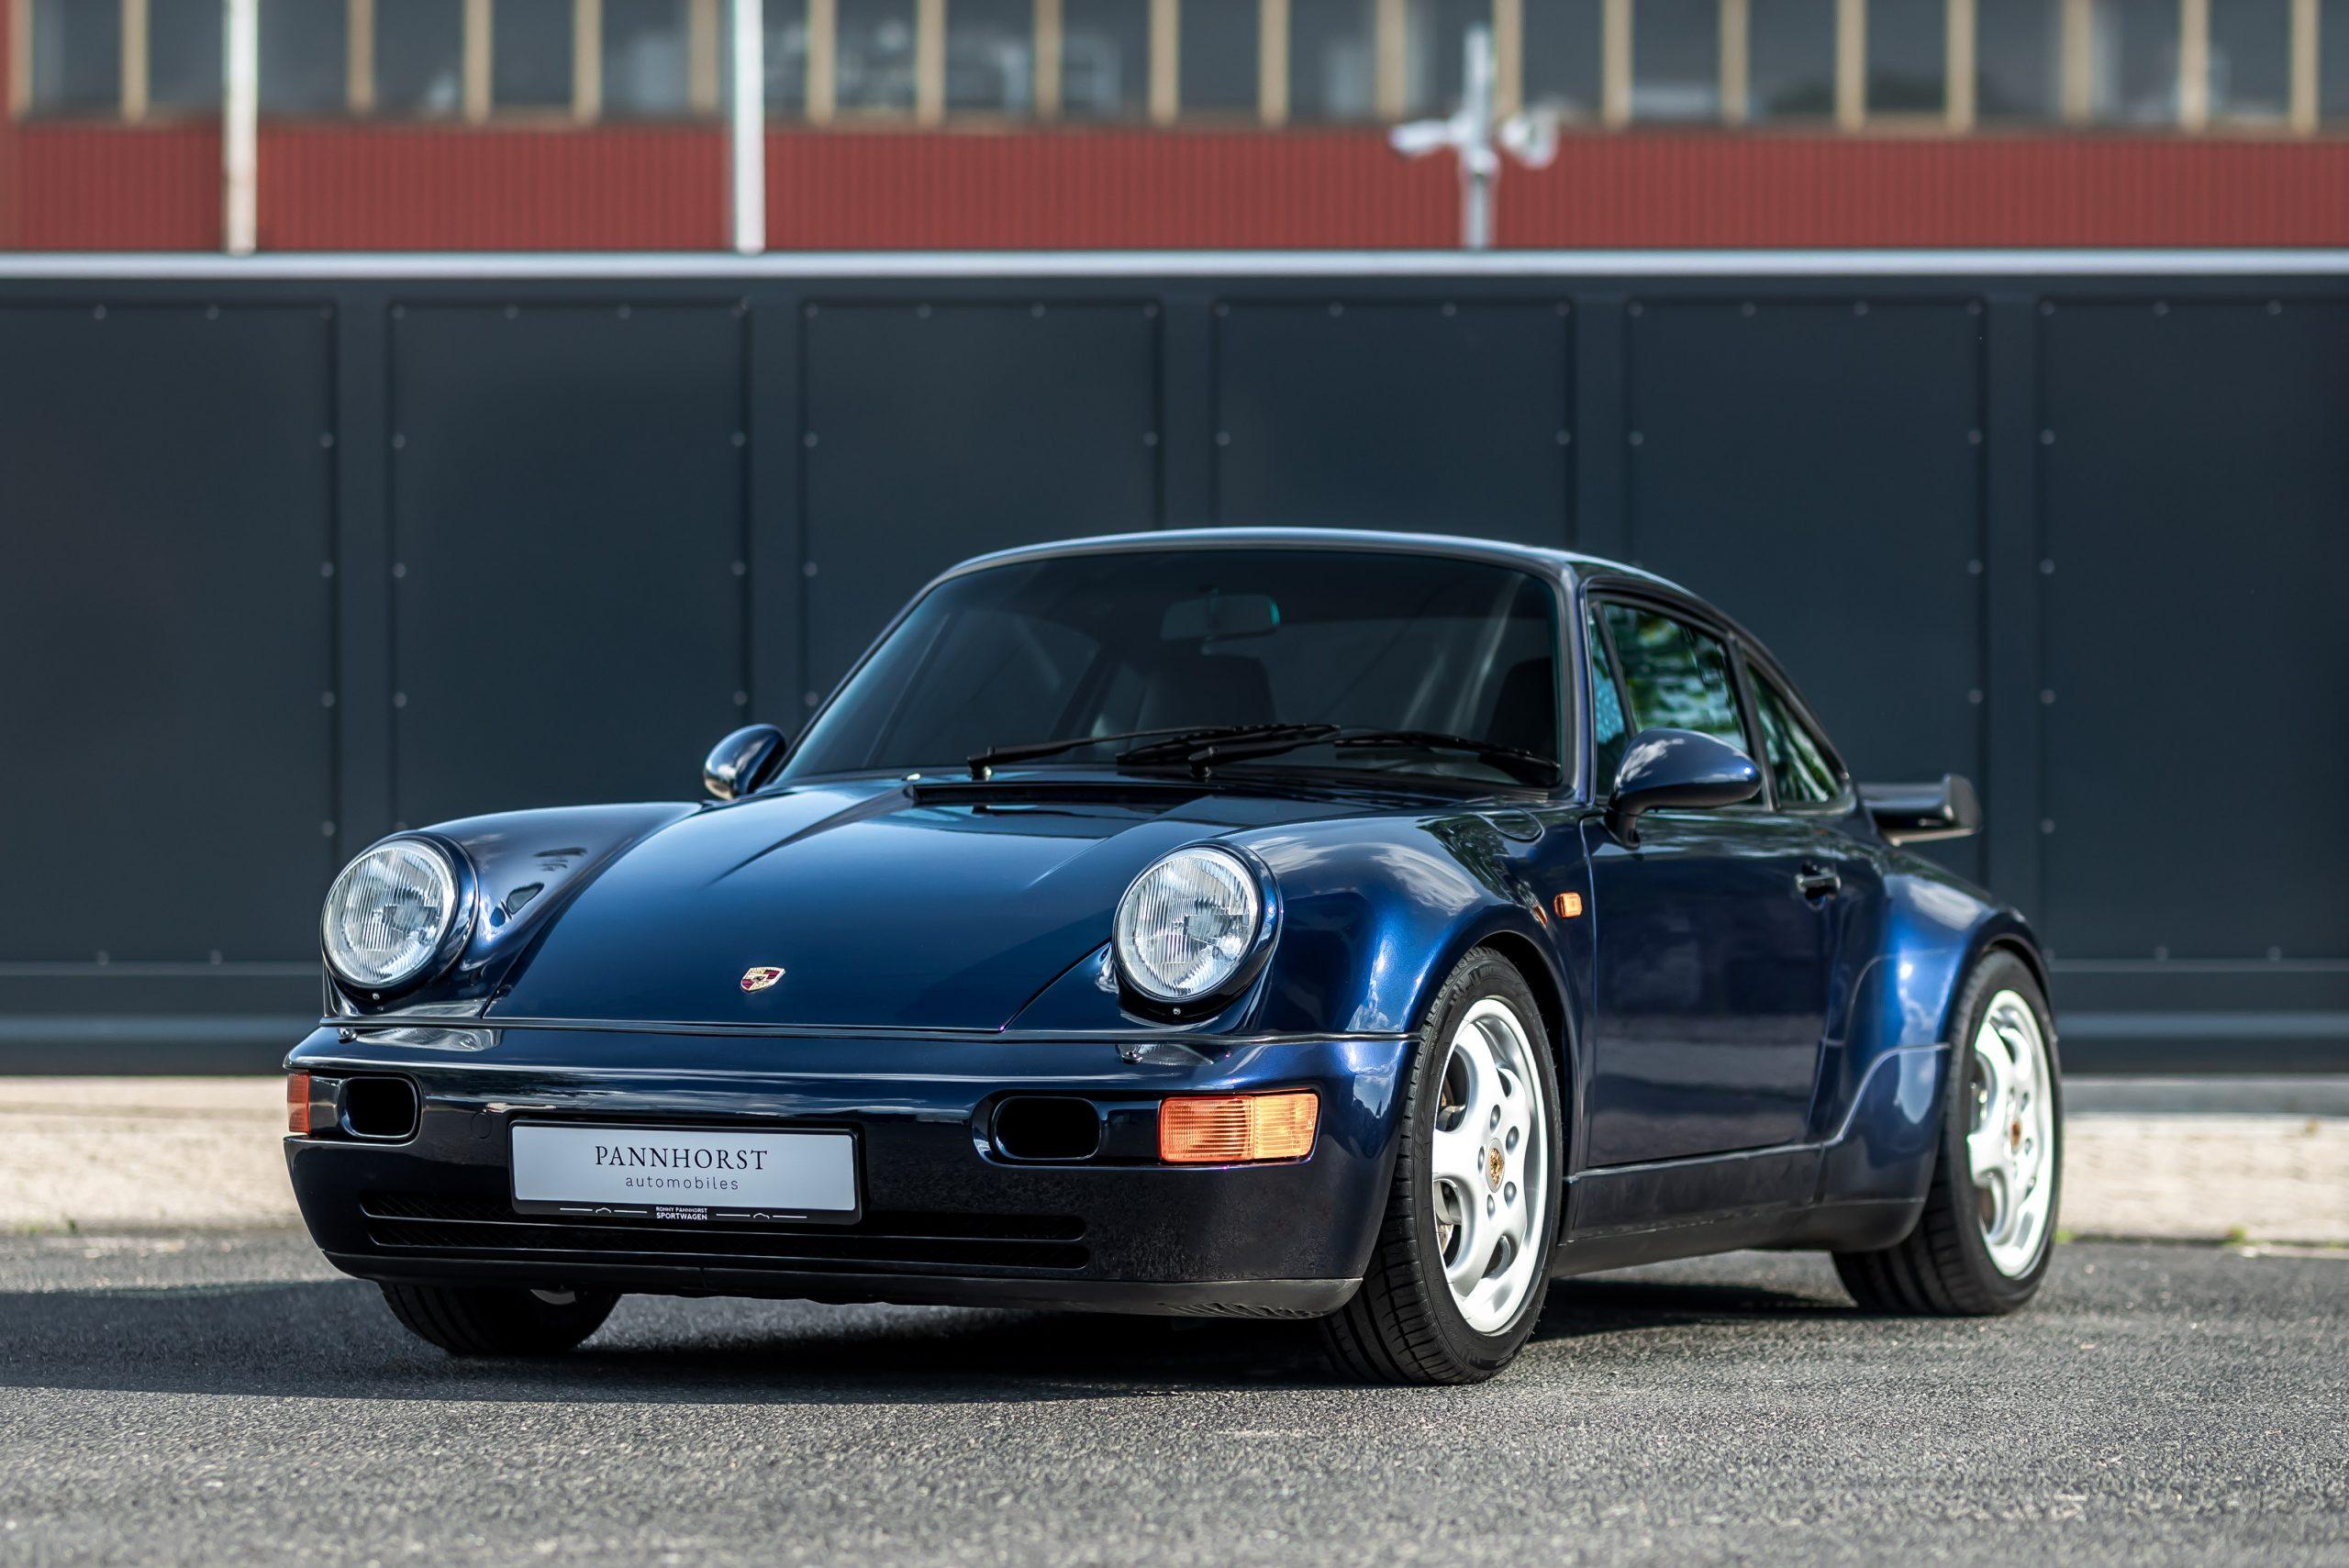 Porsche 964 Turbo 3.3 ltr.